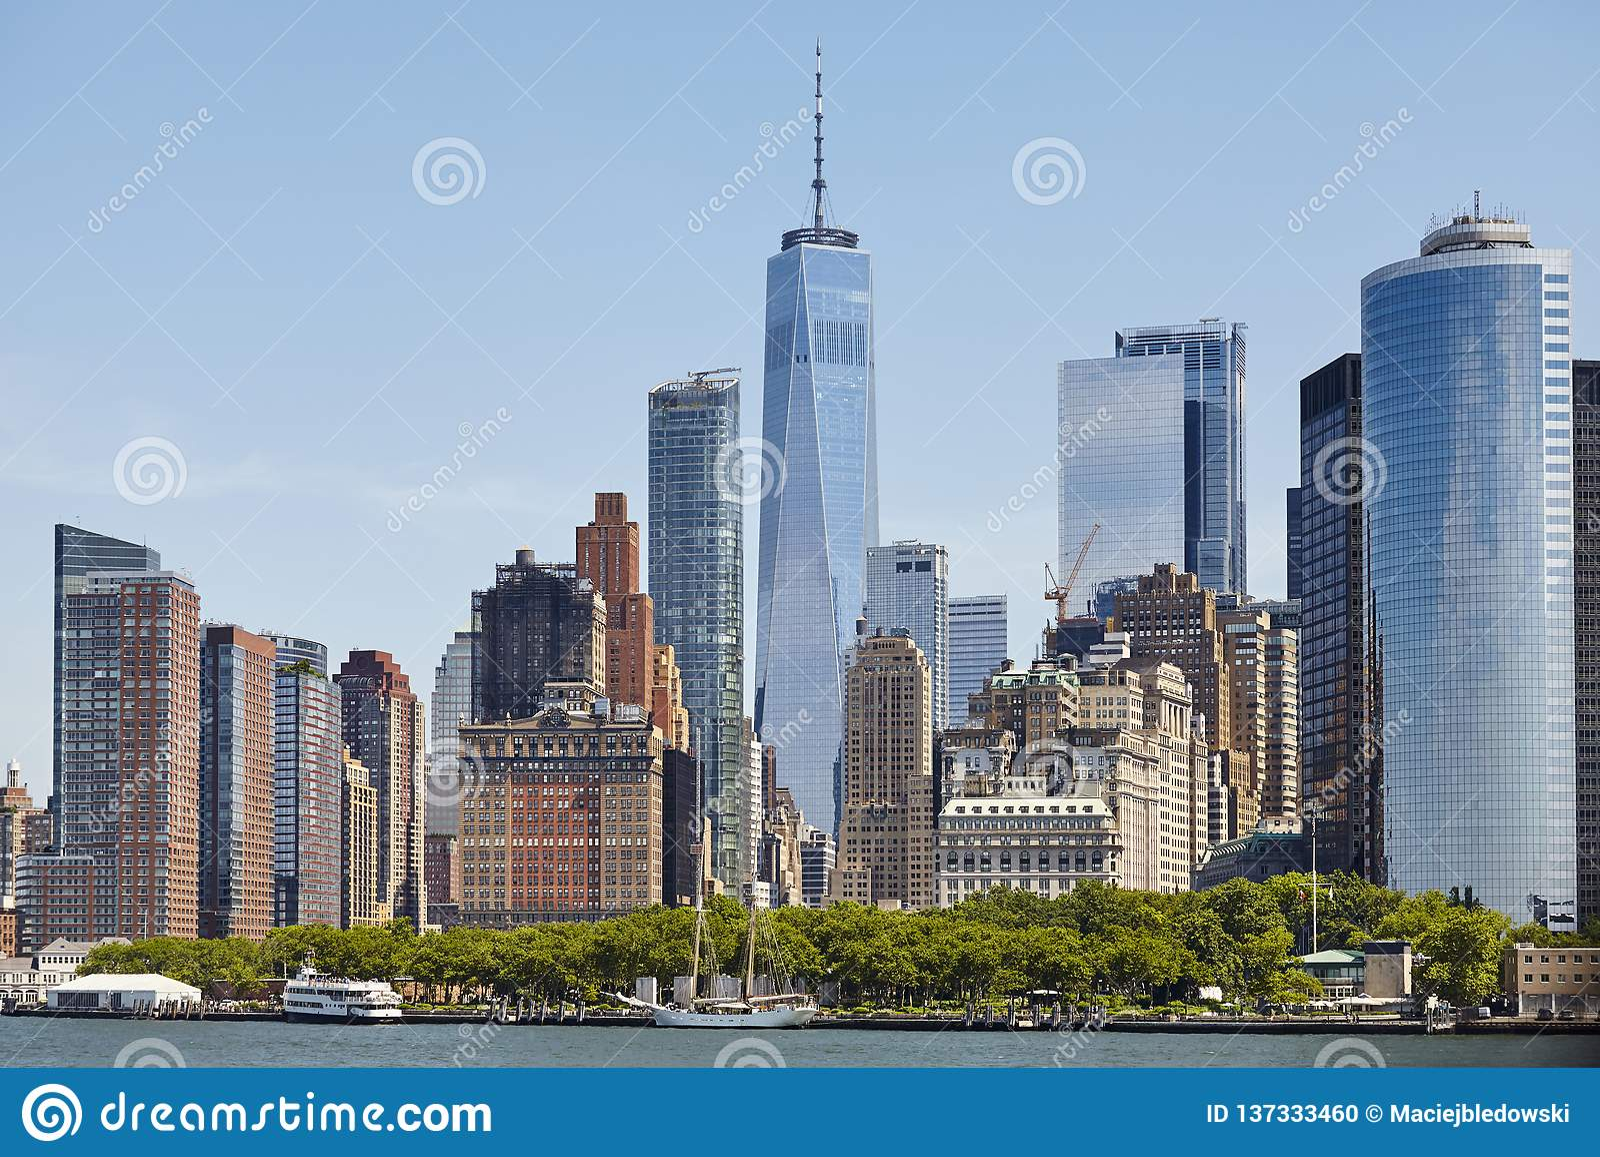 Manhattan linia horyzontu na słonecznym dniu, usa